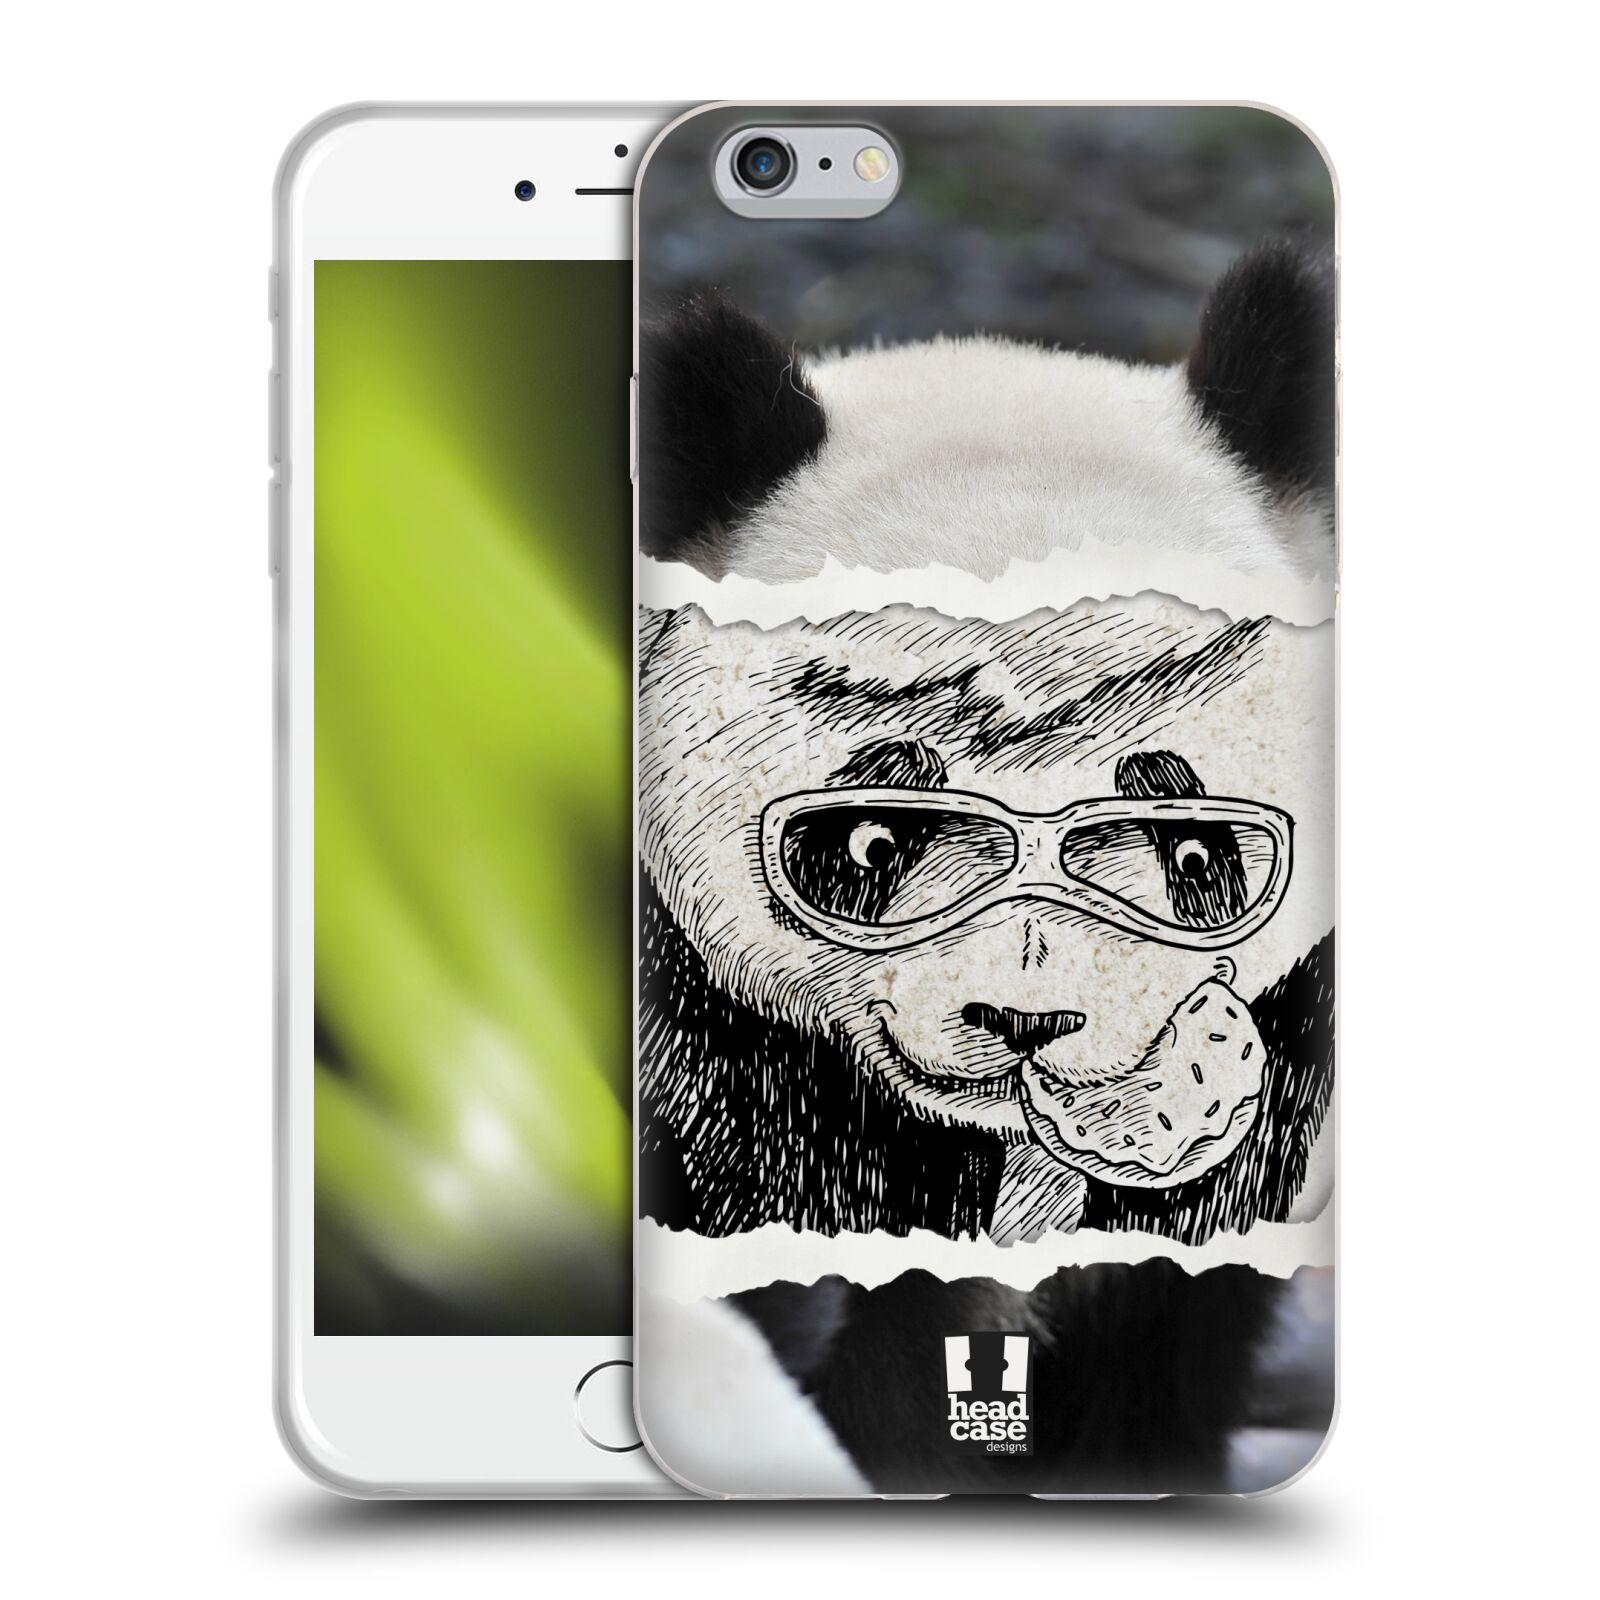 HEAD CASE silikonový obal na mobil Apple Iphone 6 PLUS/ 6S PLUS vzor zvířata koláž roztomilá panda